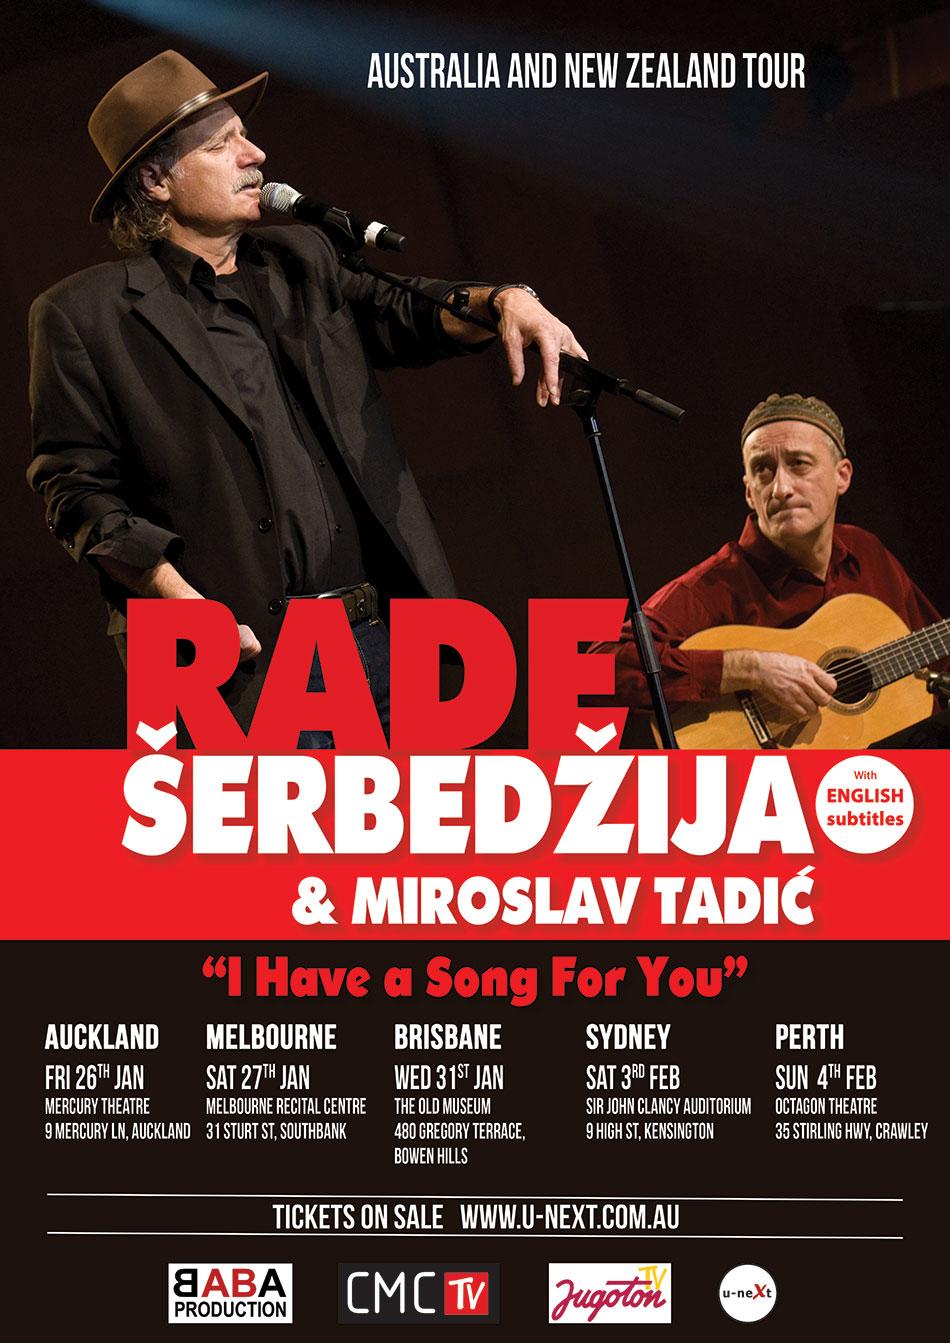 Rade_Serbedzija_Poster_v02-950.jpg